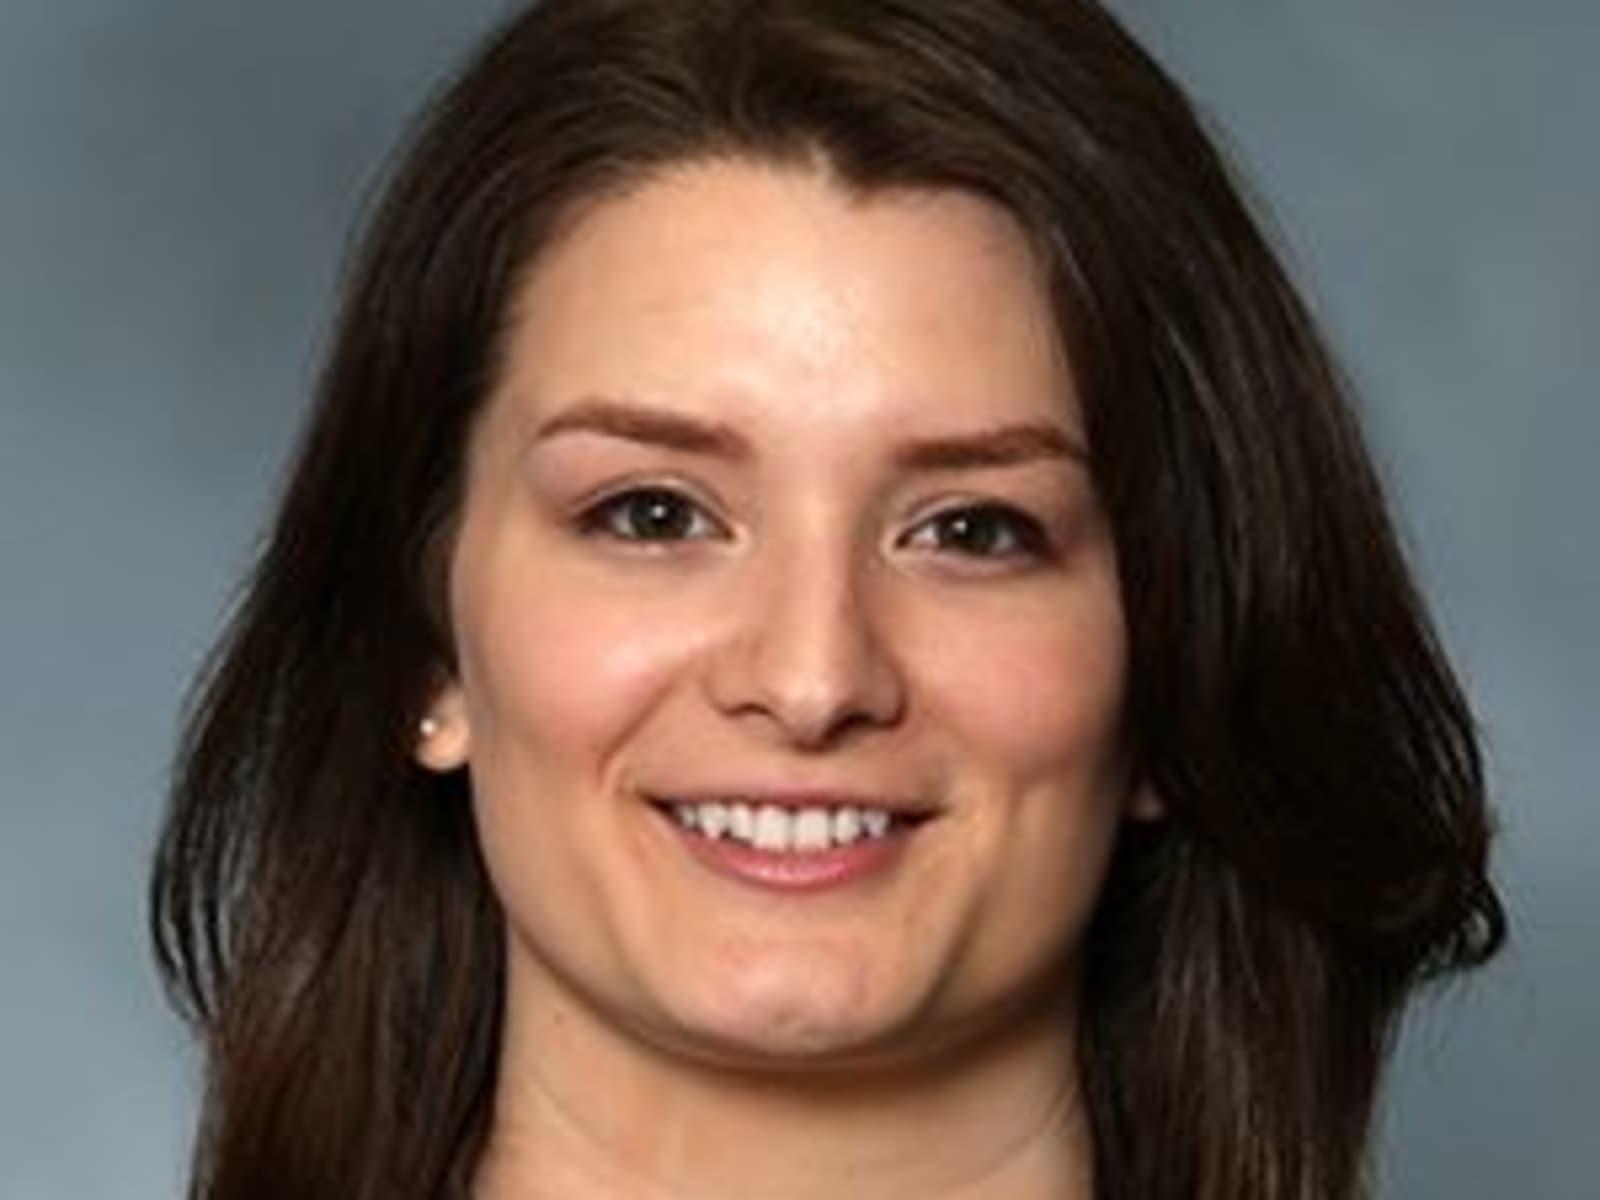 Amy from Saint Joseph, Missouri, United States